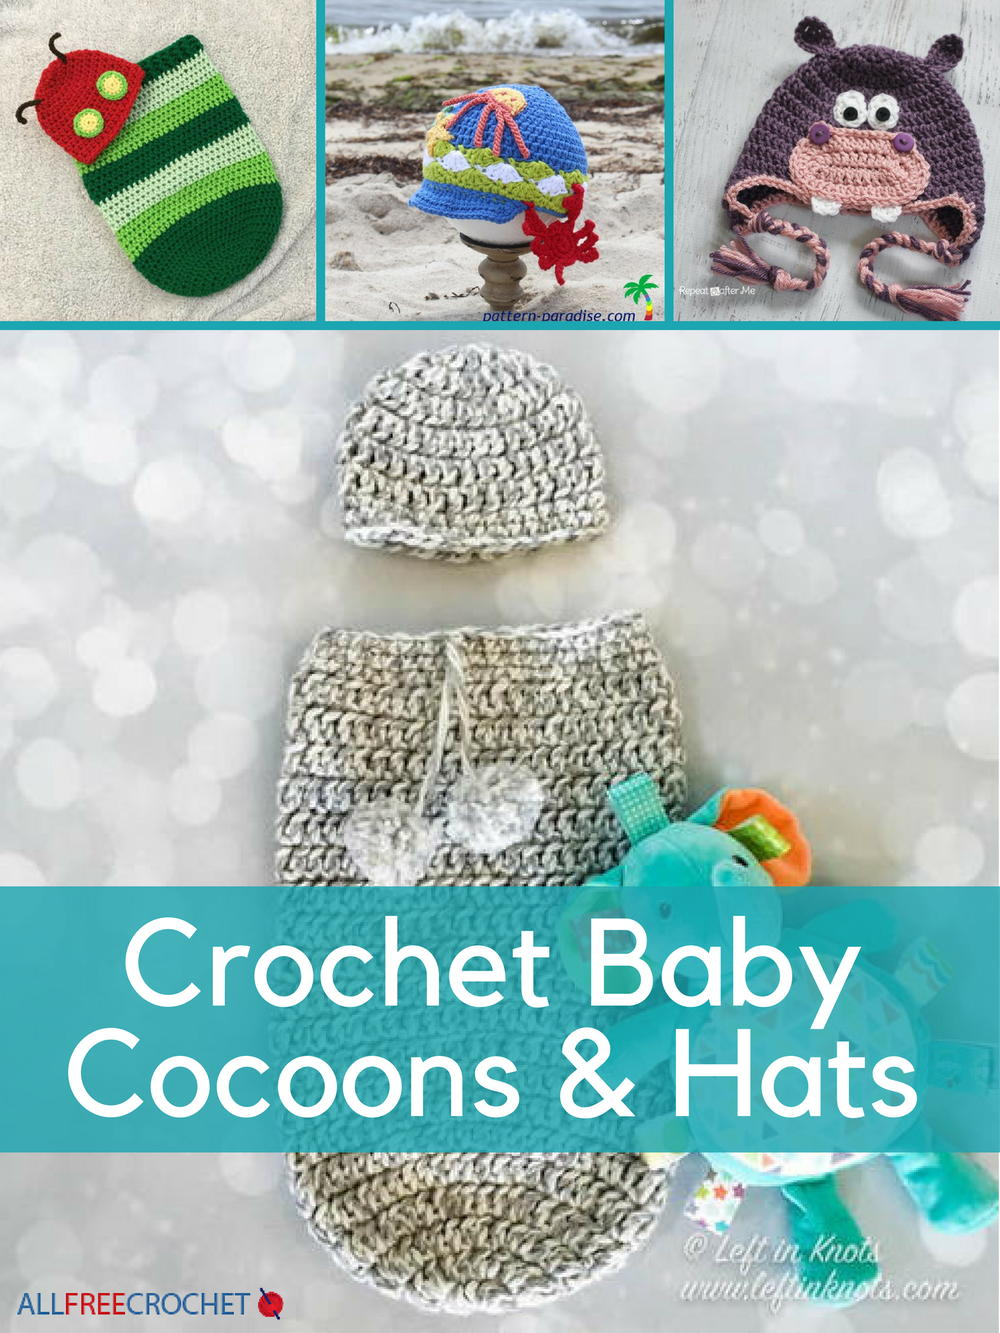 34 Crochet Baby Patterns Crochet Baby Cocoons